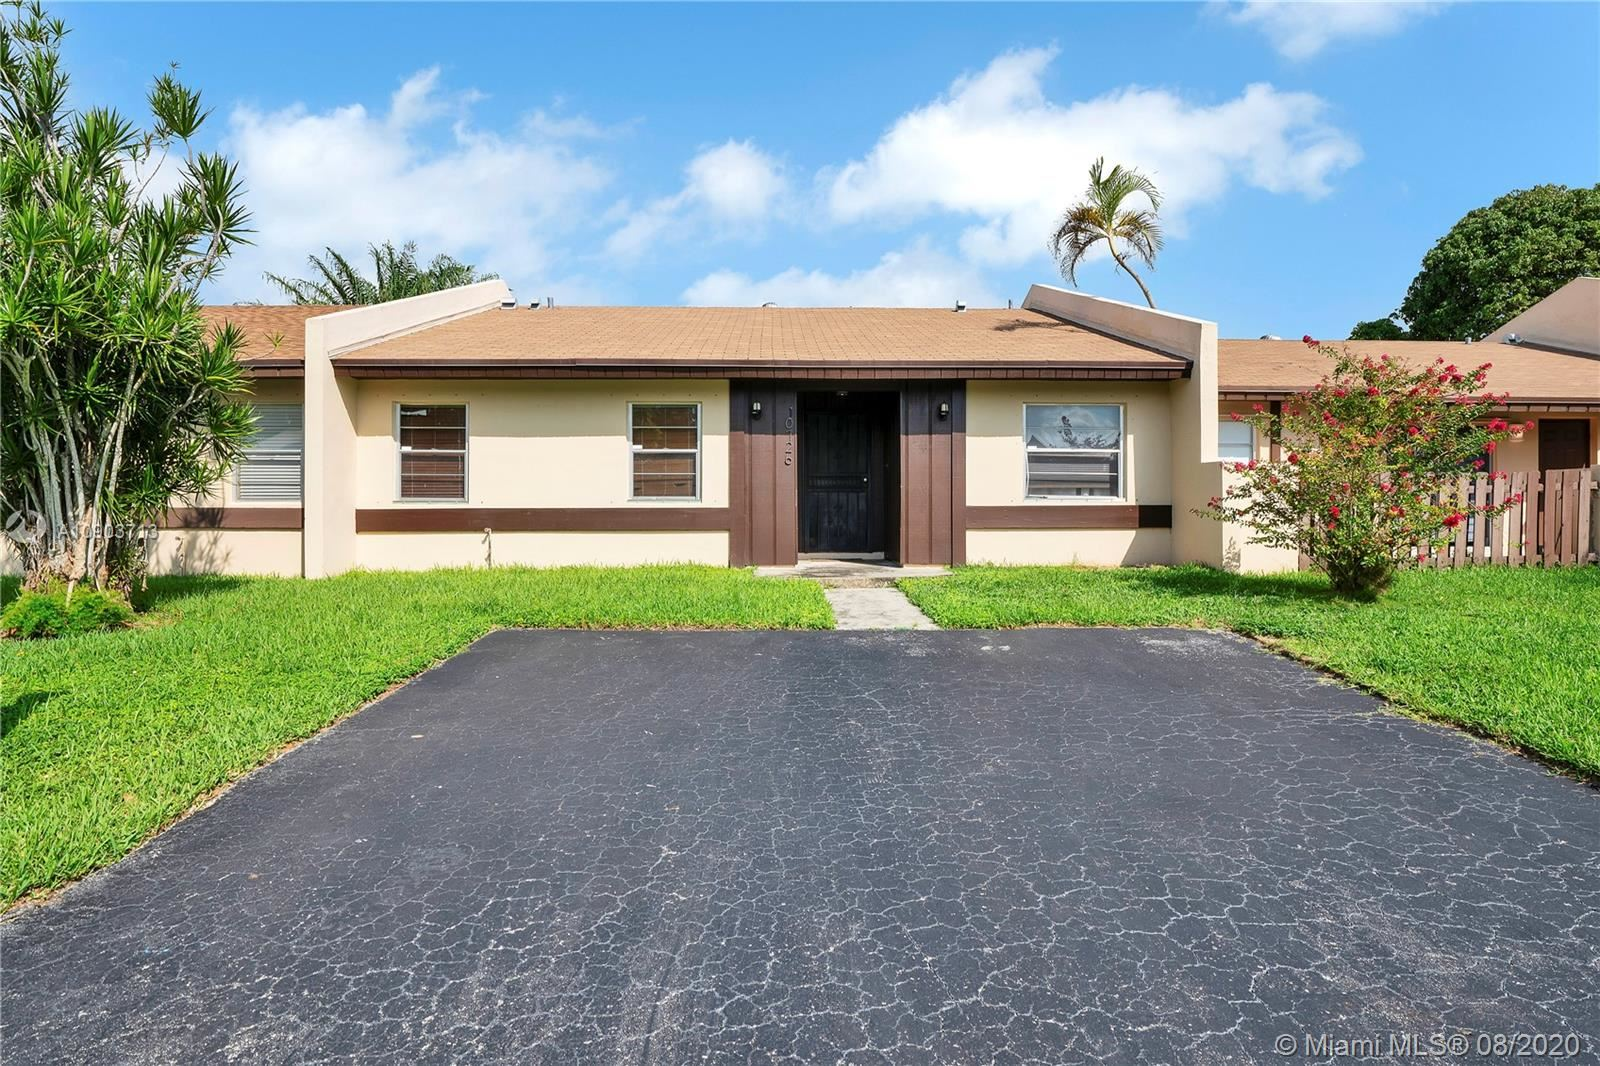 10726 SW 123rd Pl #., Miami, FL 33186 - #: A10903713